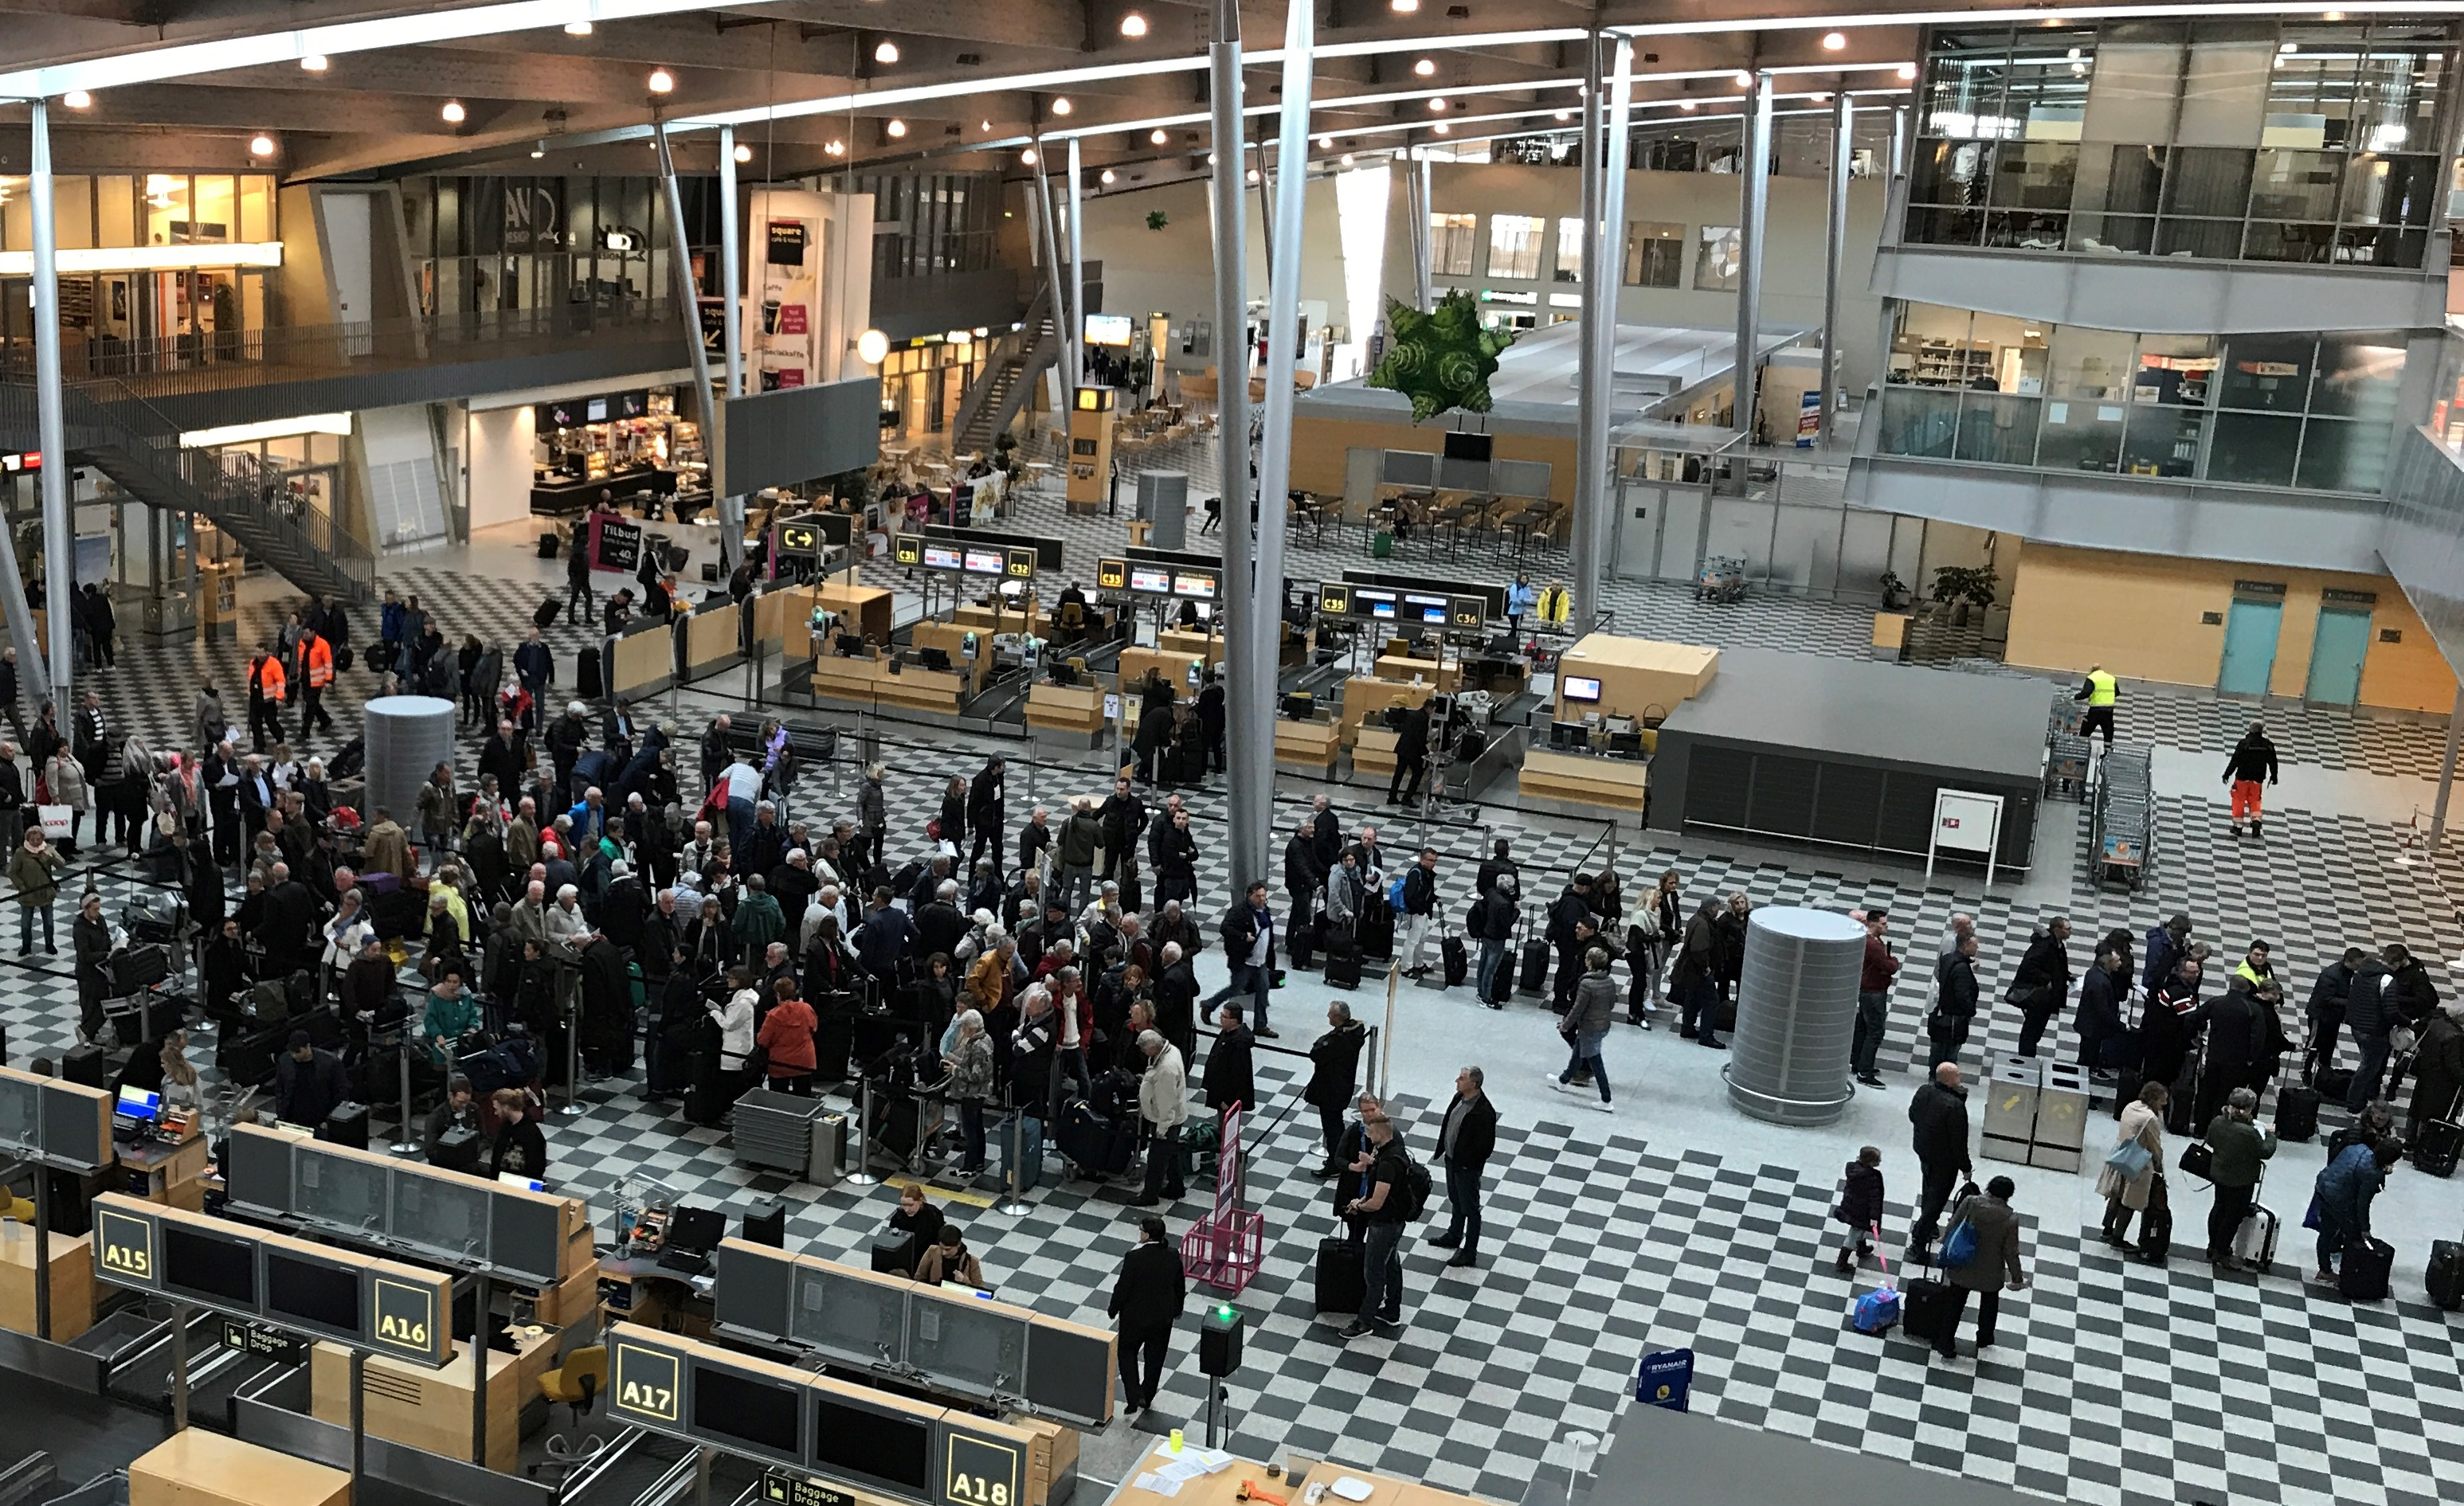 Kø i afgangshallen i Billund Lufthavn. (Foto: Ole Kirchert Christensen)